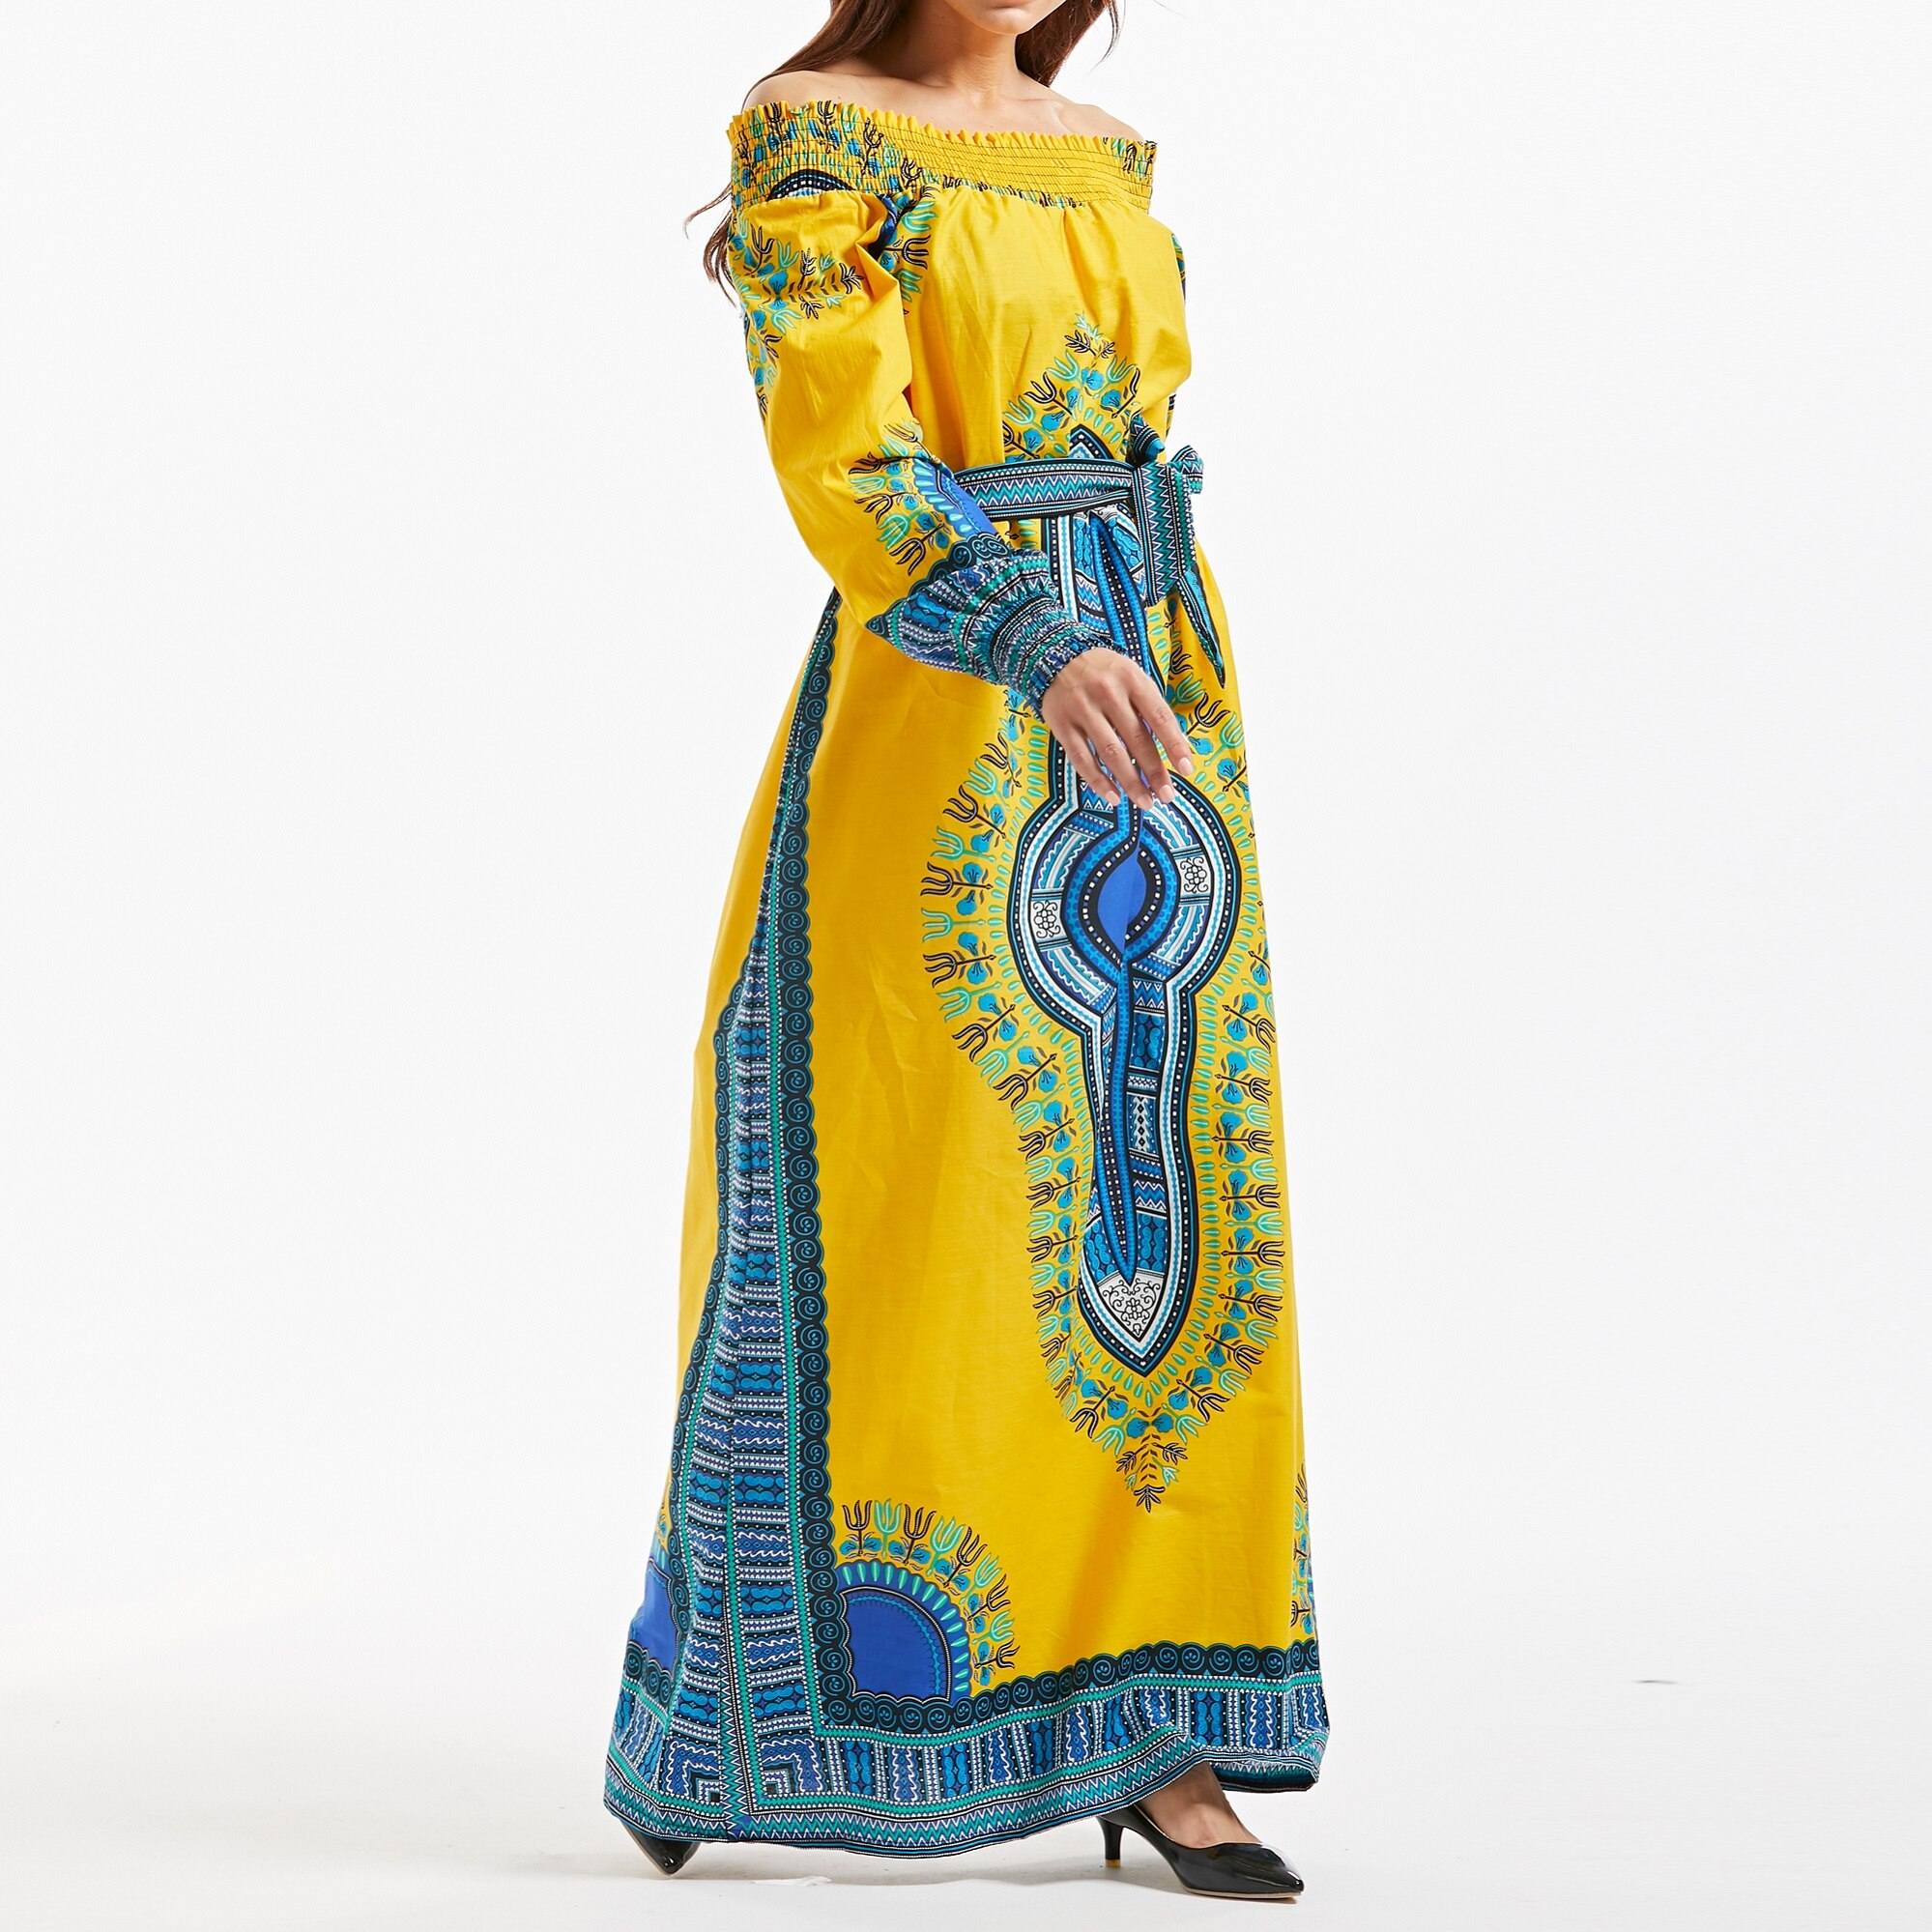 New African Design Dashiki Bazin Long Sleeve Dashiki Dress For Lady 100% Cotton 2019